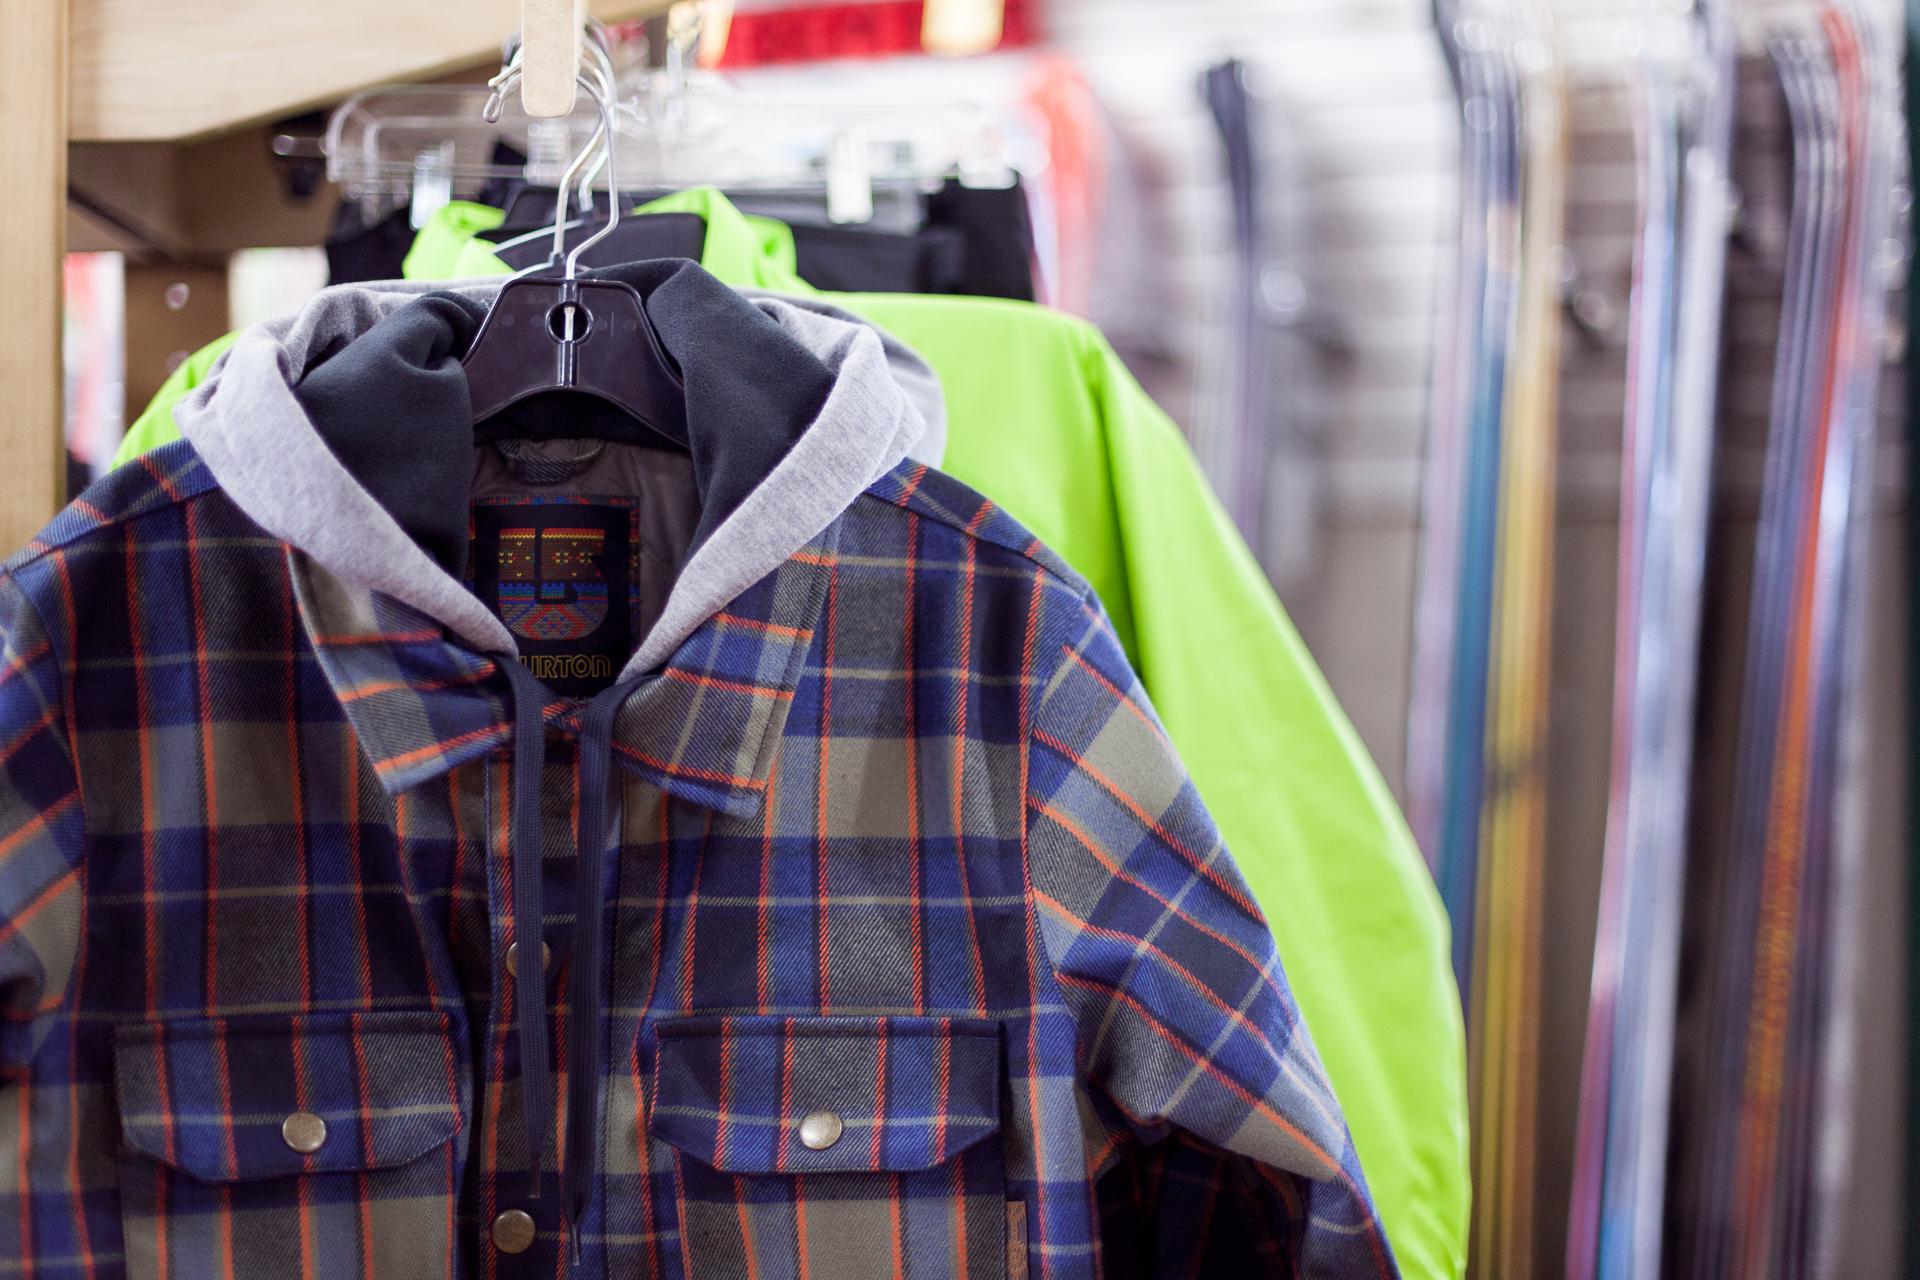 old_town_sports_novato_bike_ski_and_snowboard_shop_burton_mens_jackets